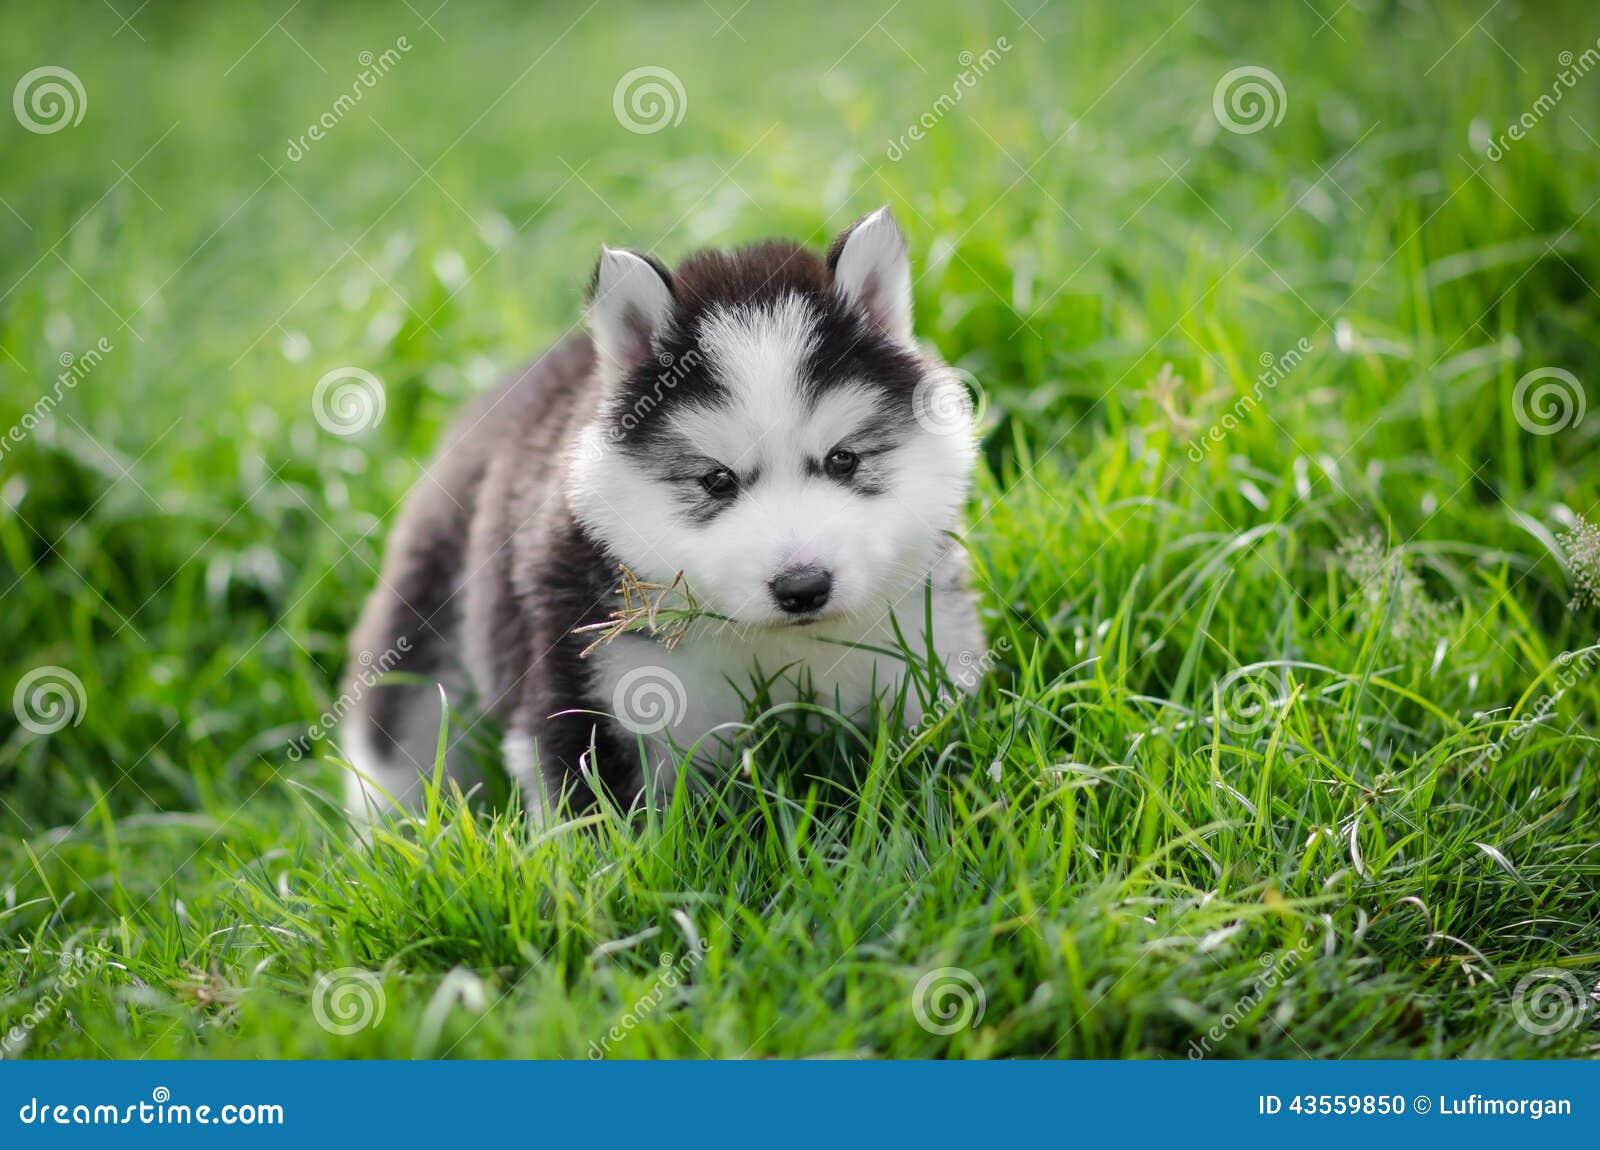 Puppy Siberian Husky On Grass Stock Photo Image Of Furry Cute